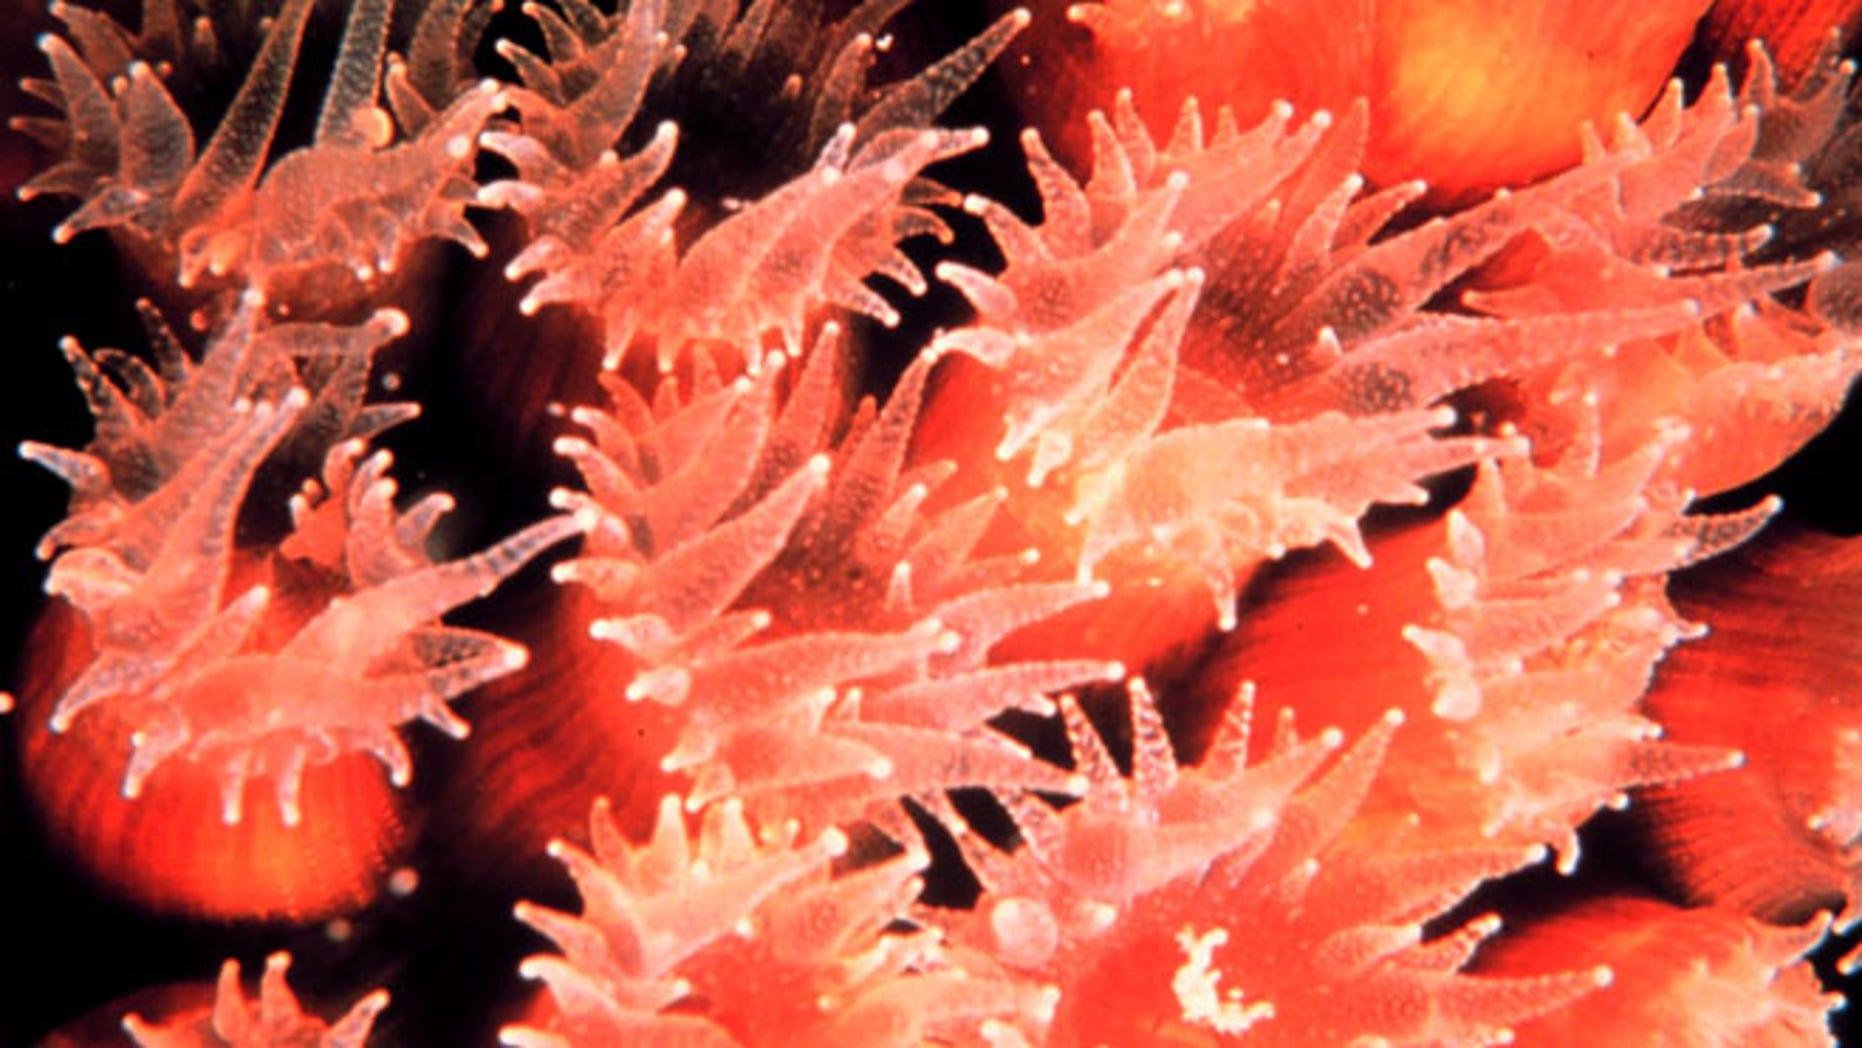 A closeup of a cavernous star coral (Montastrea cavernosa).